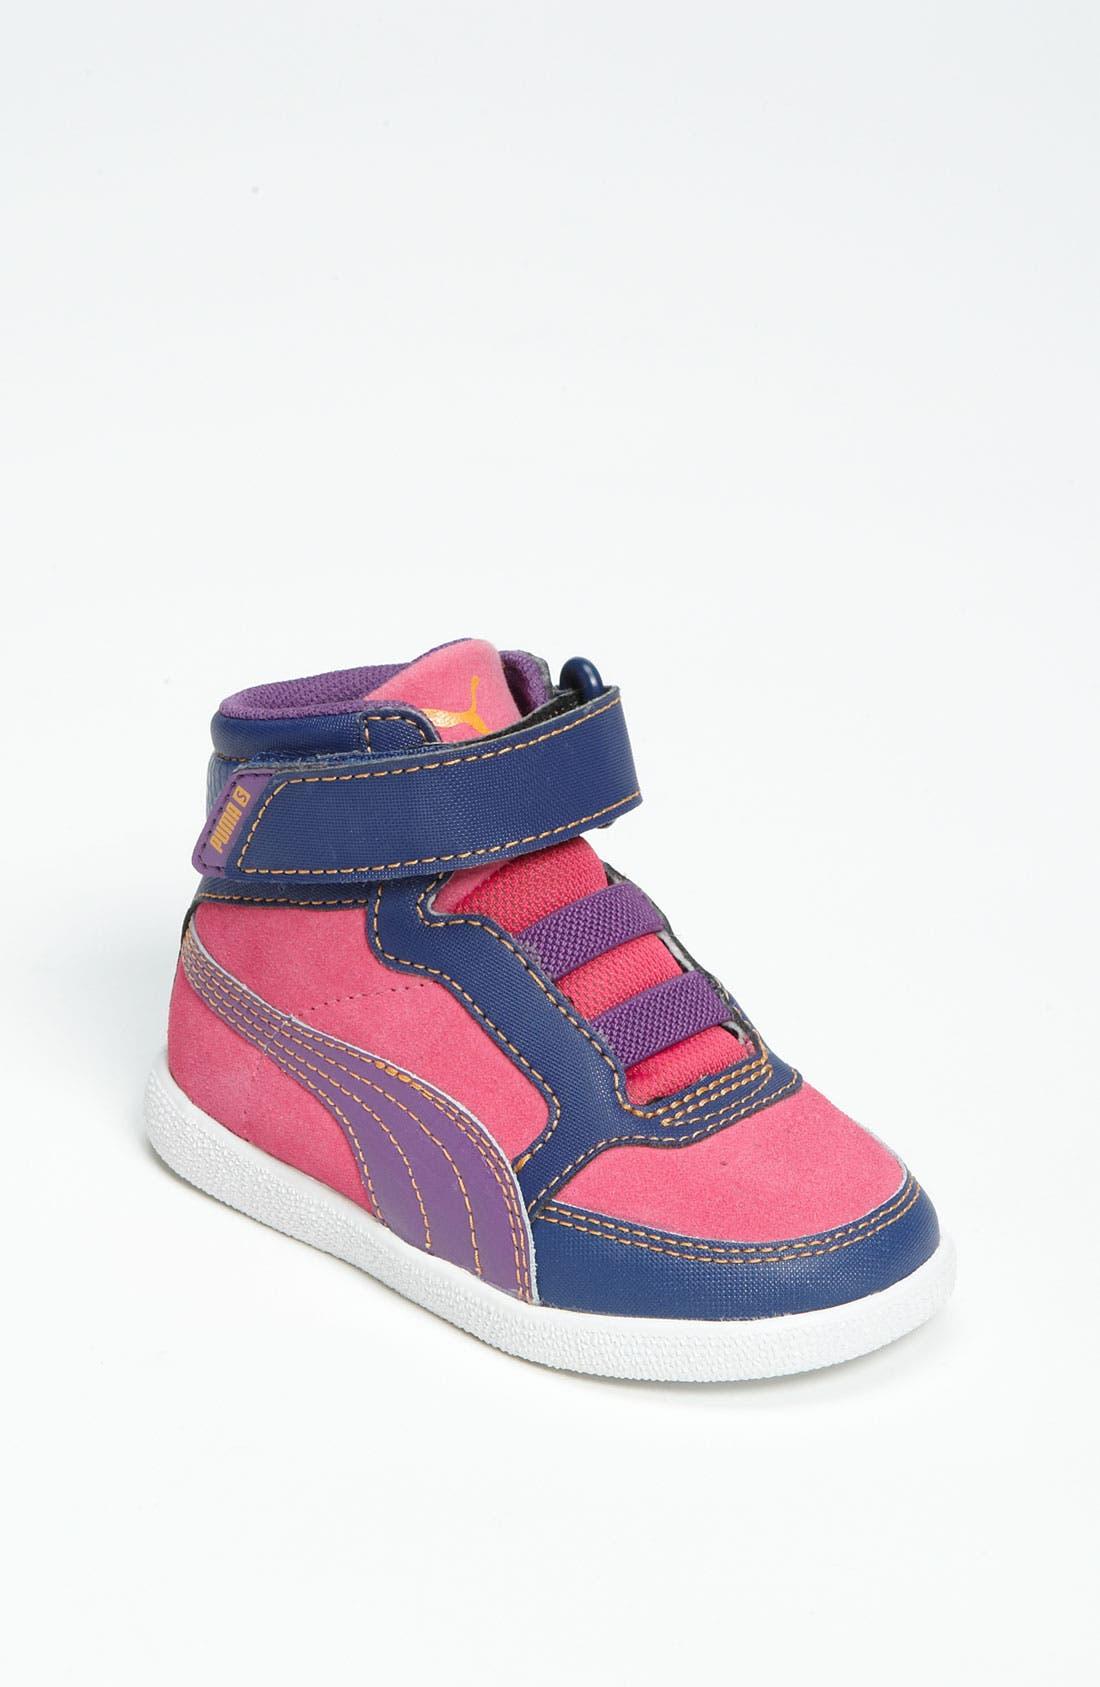 Main Image - PUMA 'Skylaa' Sneaker (Toddler, Little Kid & Big Kid)